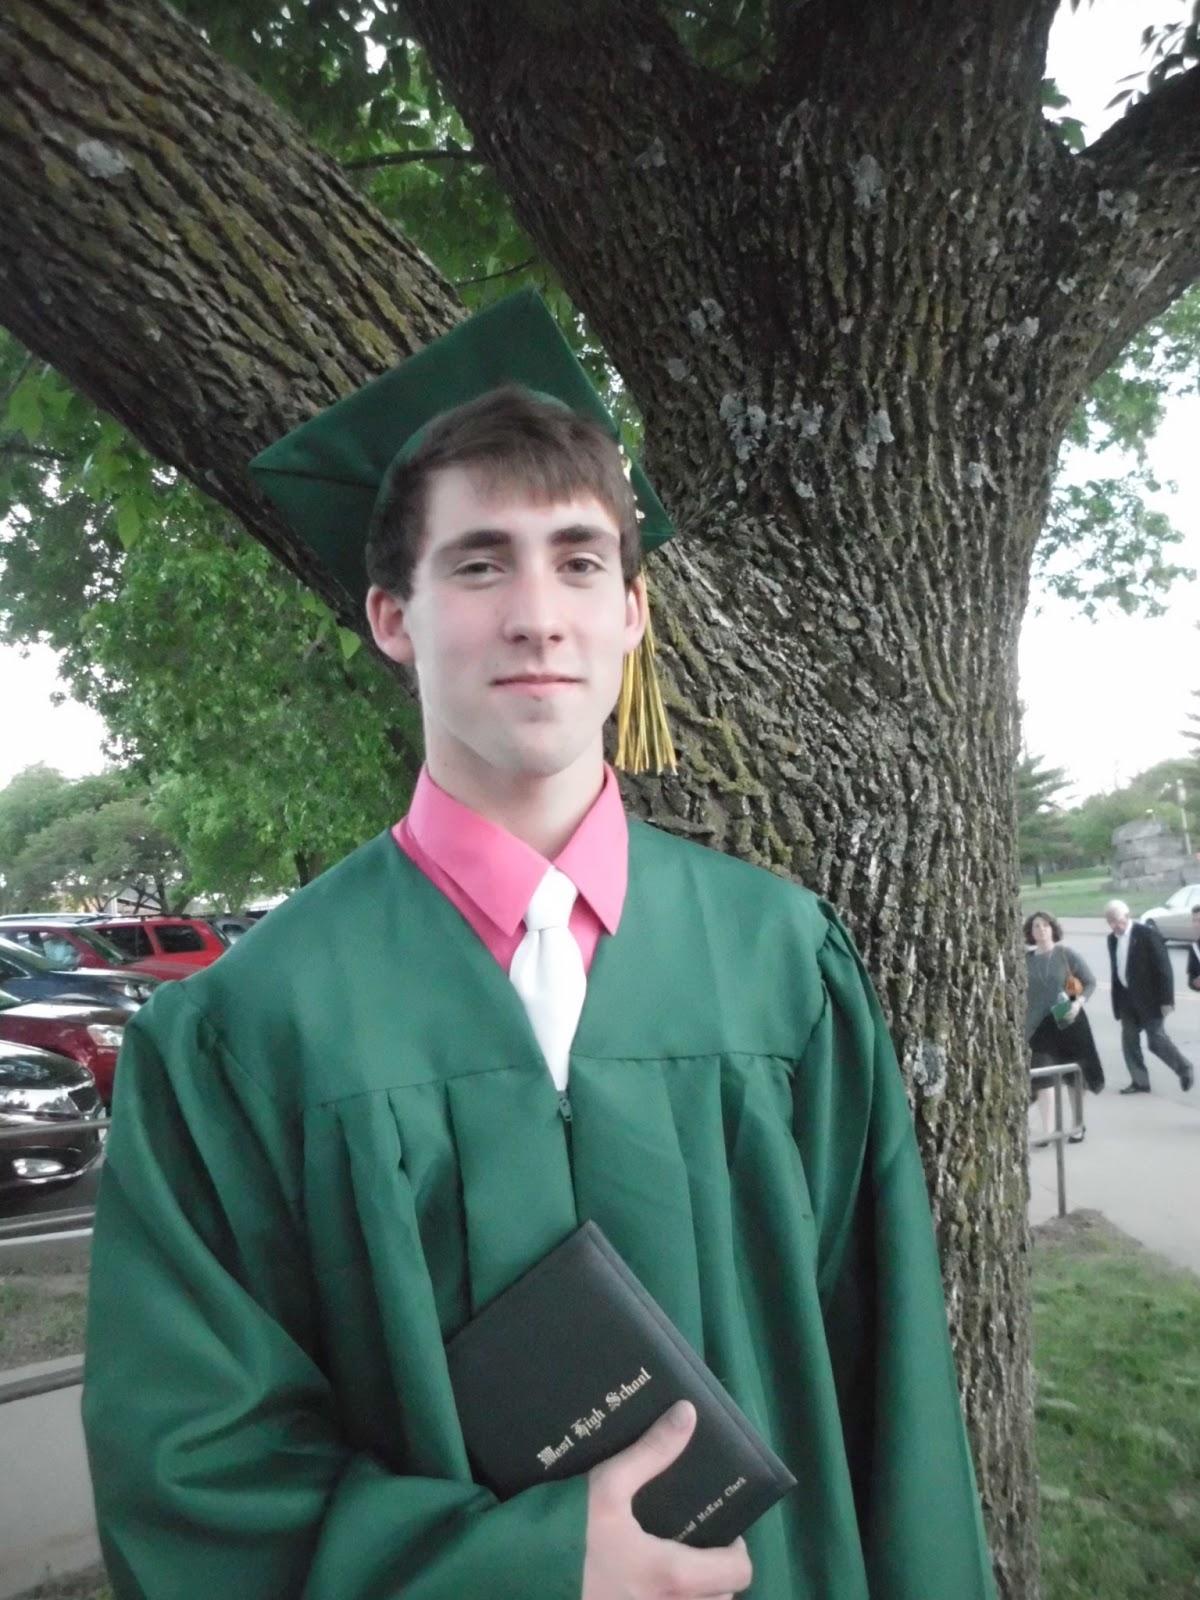 Daniel McKay Clark graduated high school and we are so proud of him